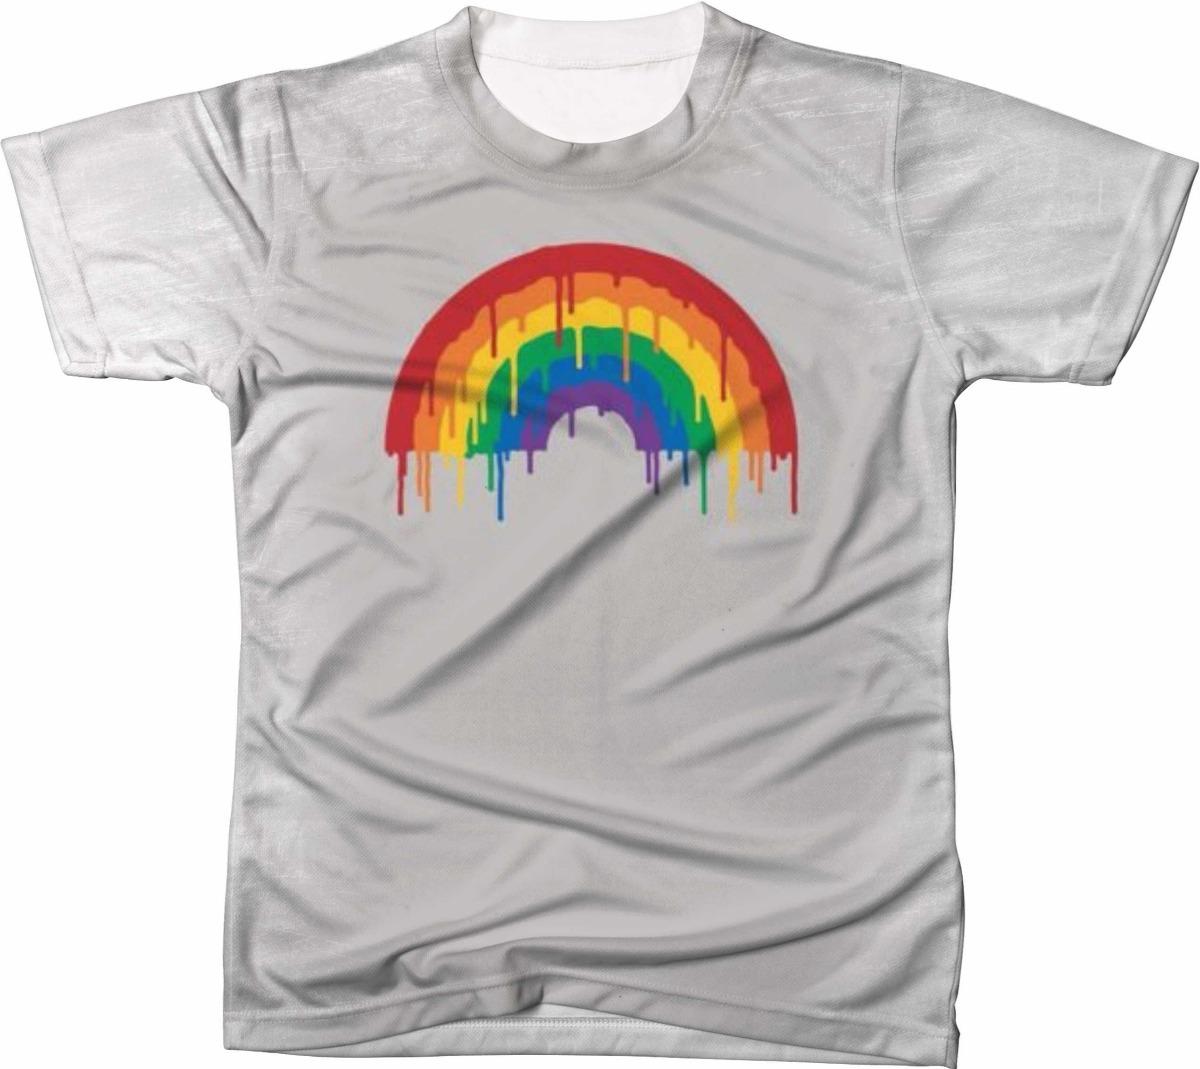 dd285b545 camiseta camisa lgbt arco iris. Carregando zoom.